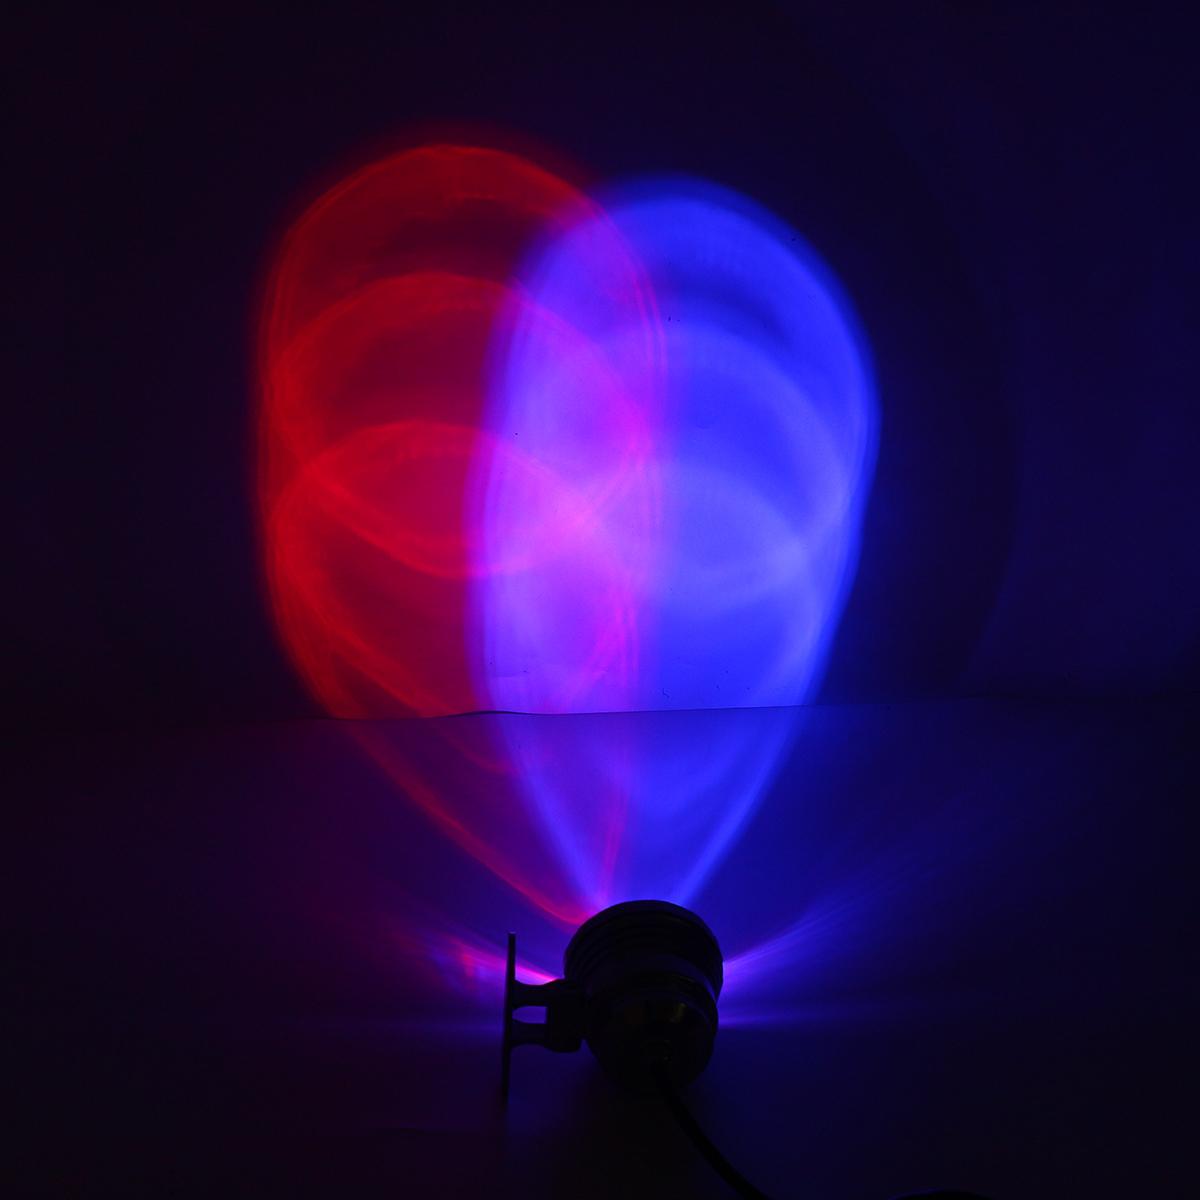 20W RGB LED Spot Lights Underwater Pool Pond Garden Lamp Waterproof + Remote